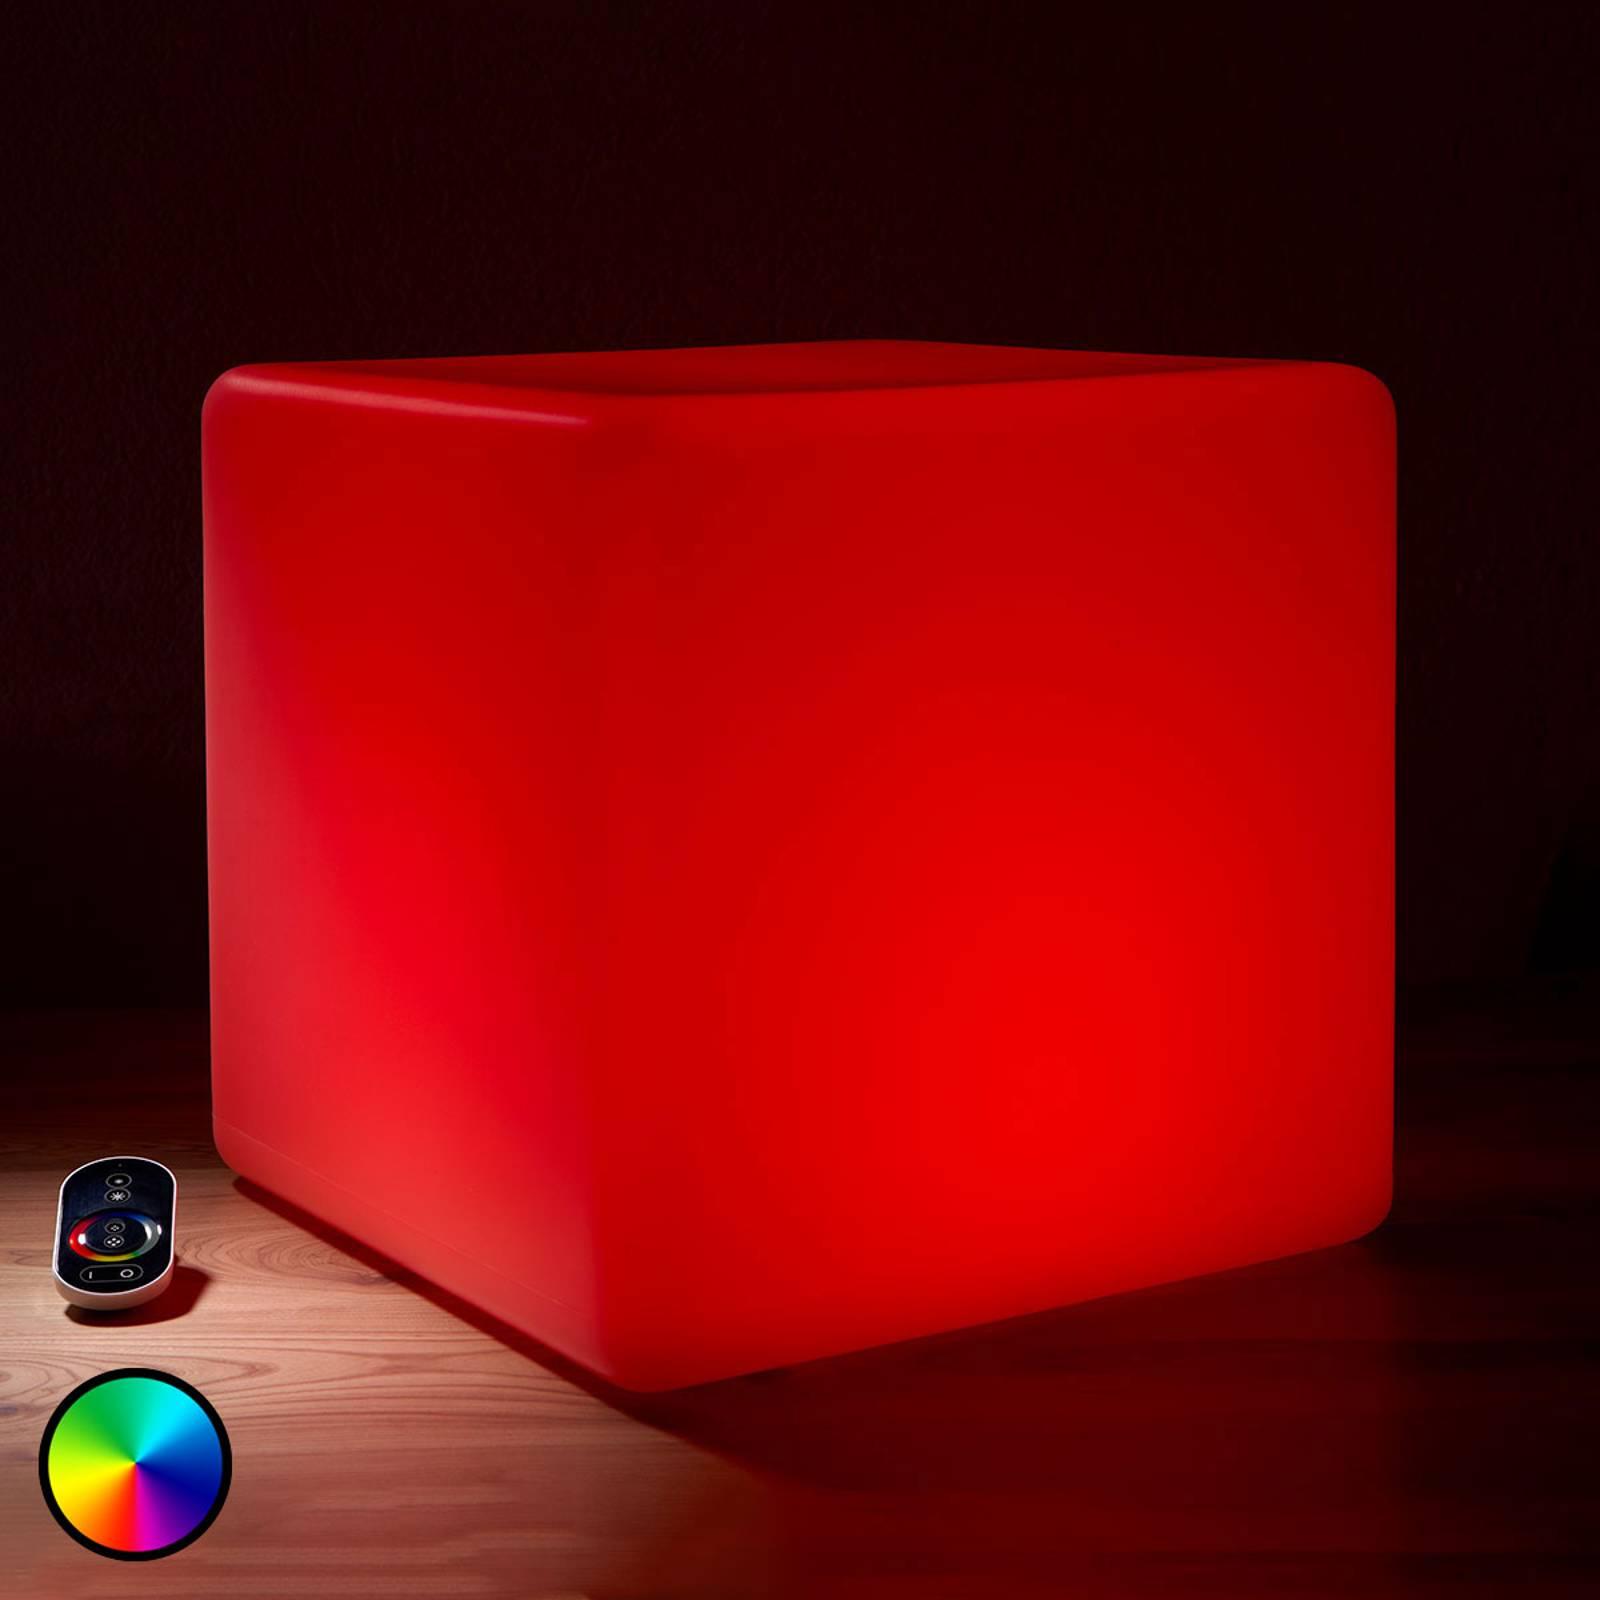 Valaiseva LED-ulkokoristekuutio, RGB 35 cm